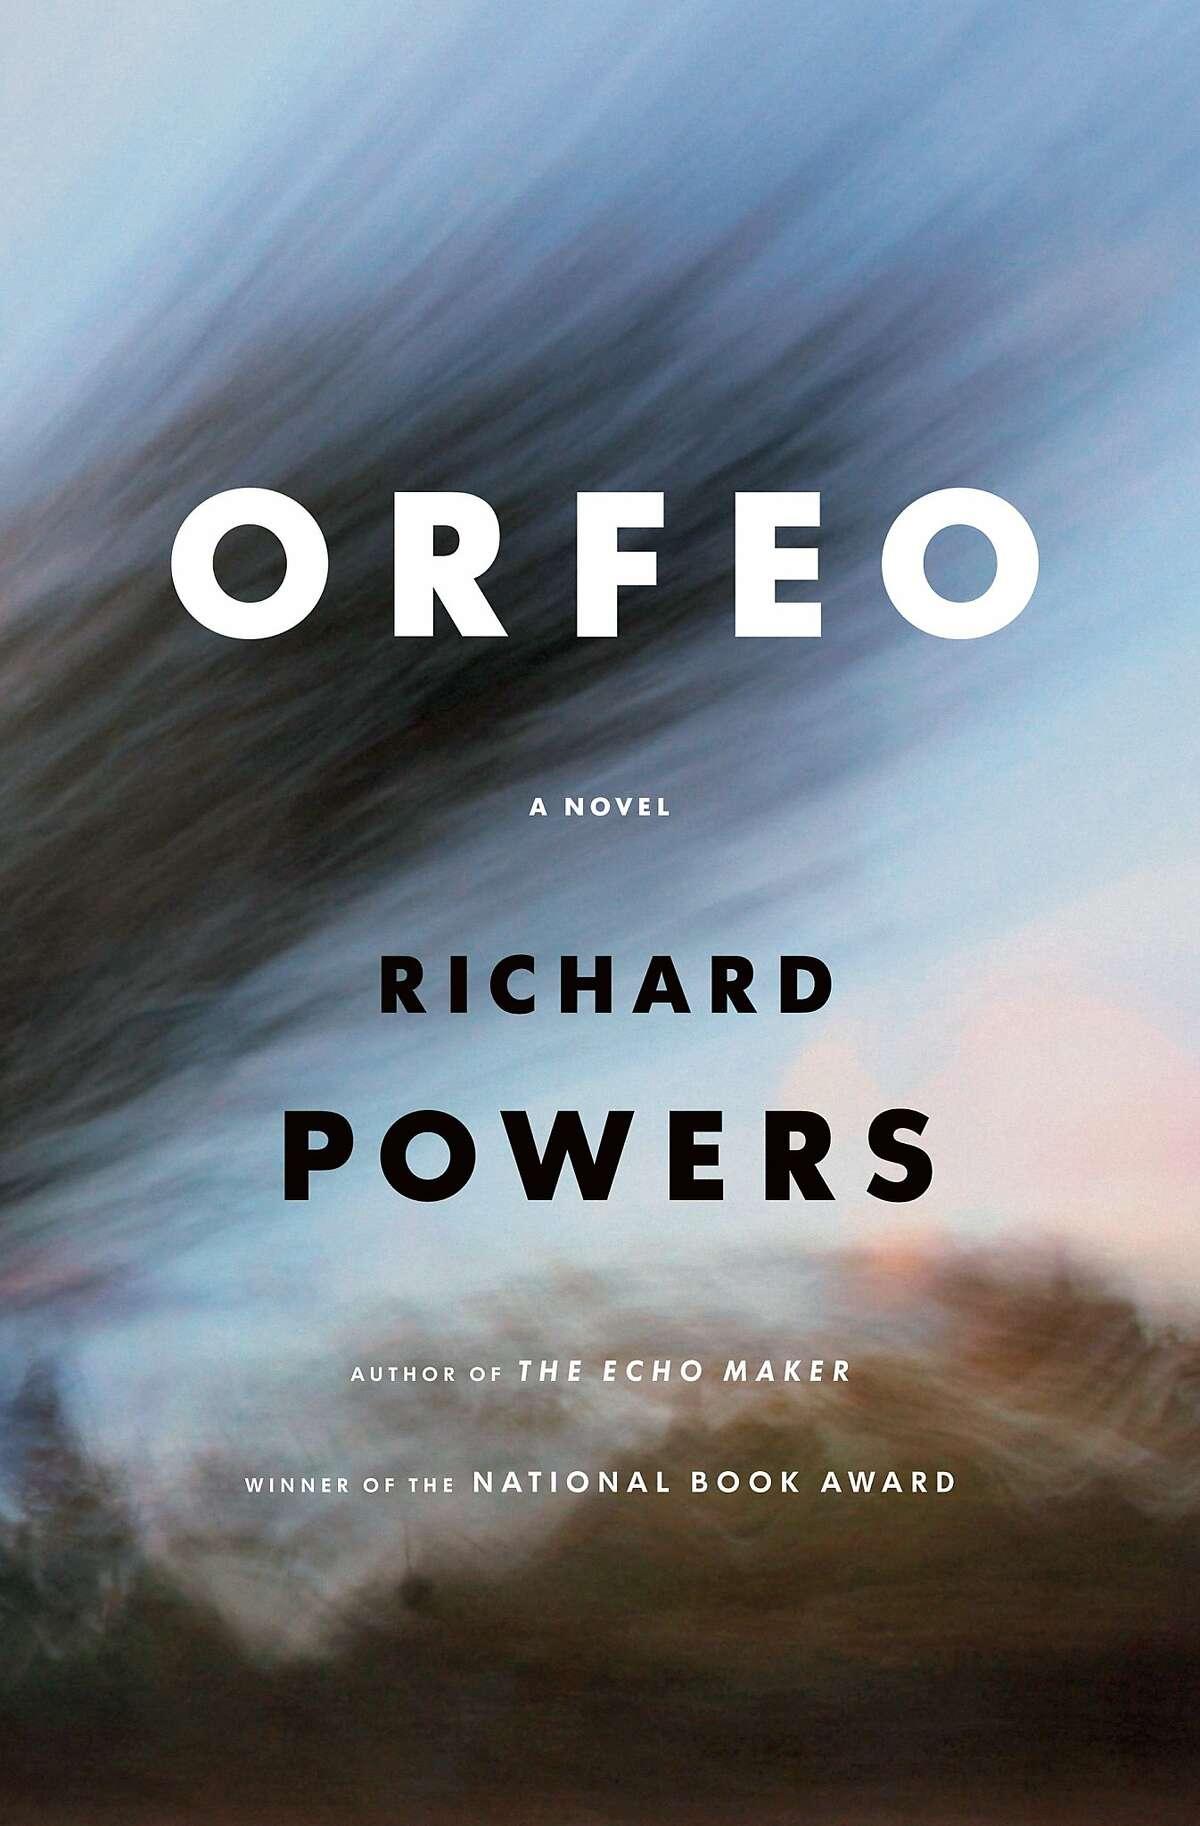 Orfeo, by Richard Powers